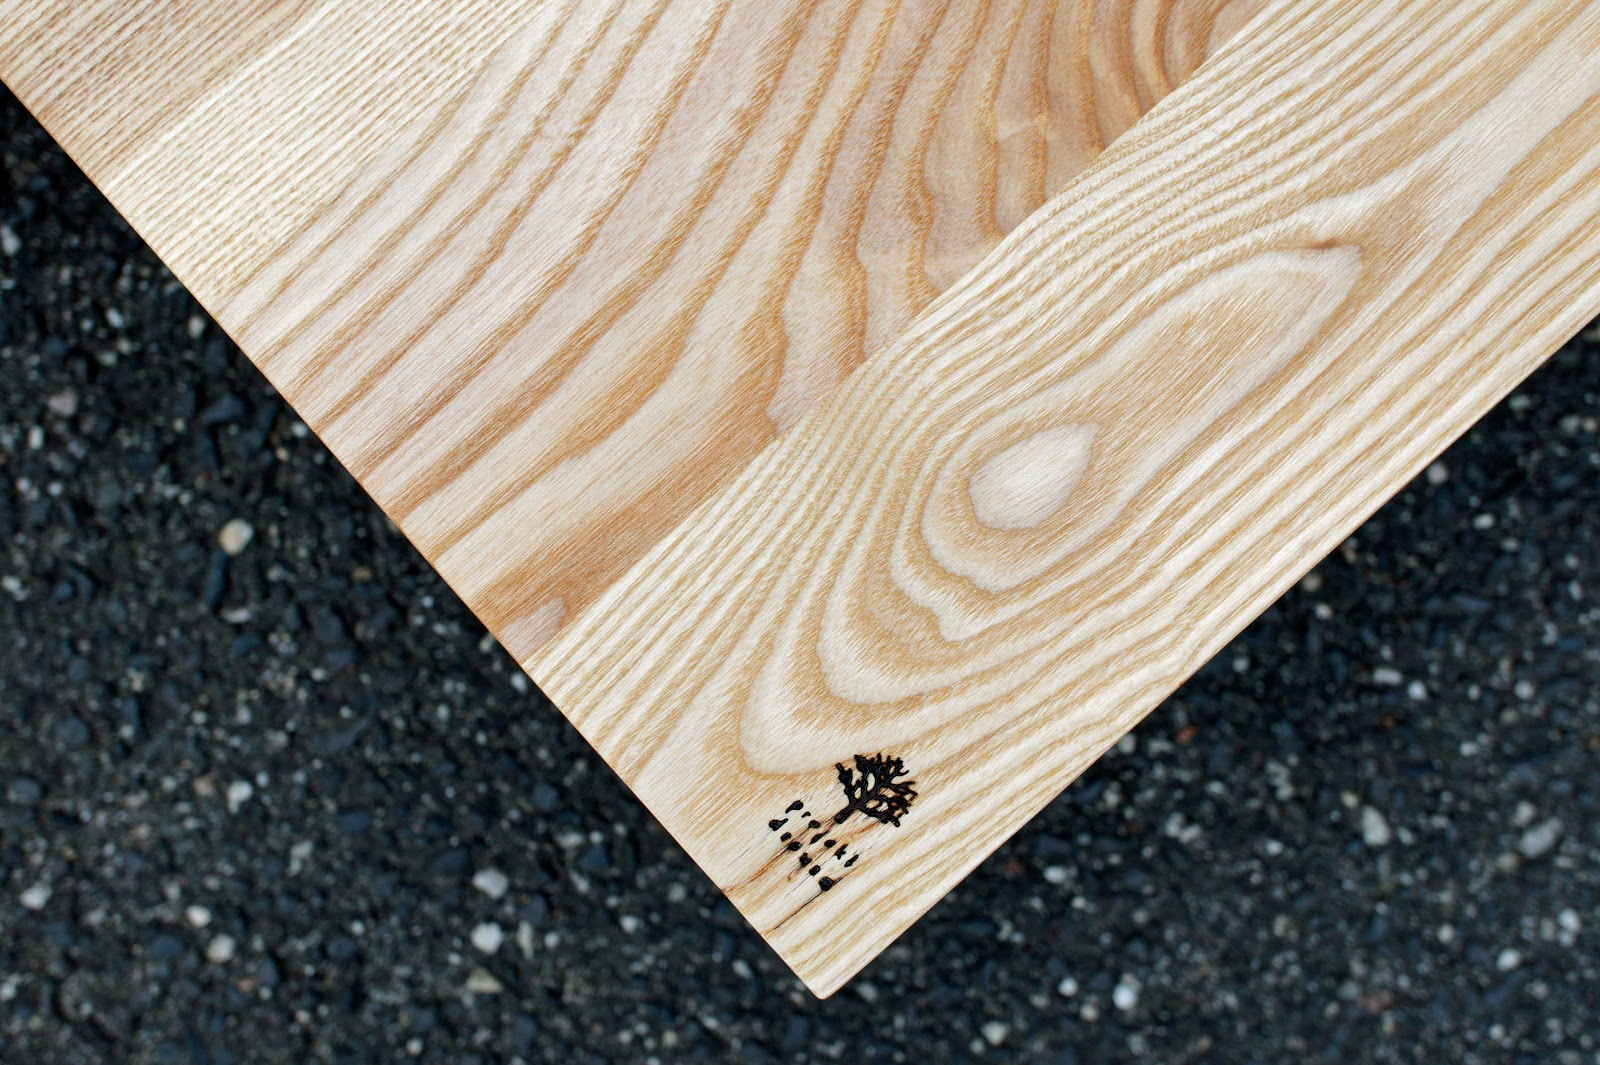 Projekt Drewno